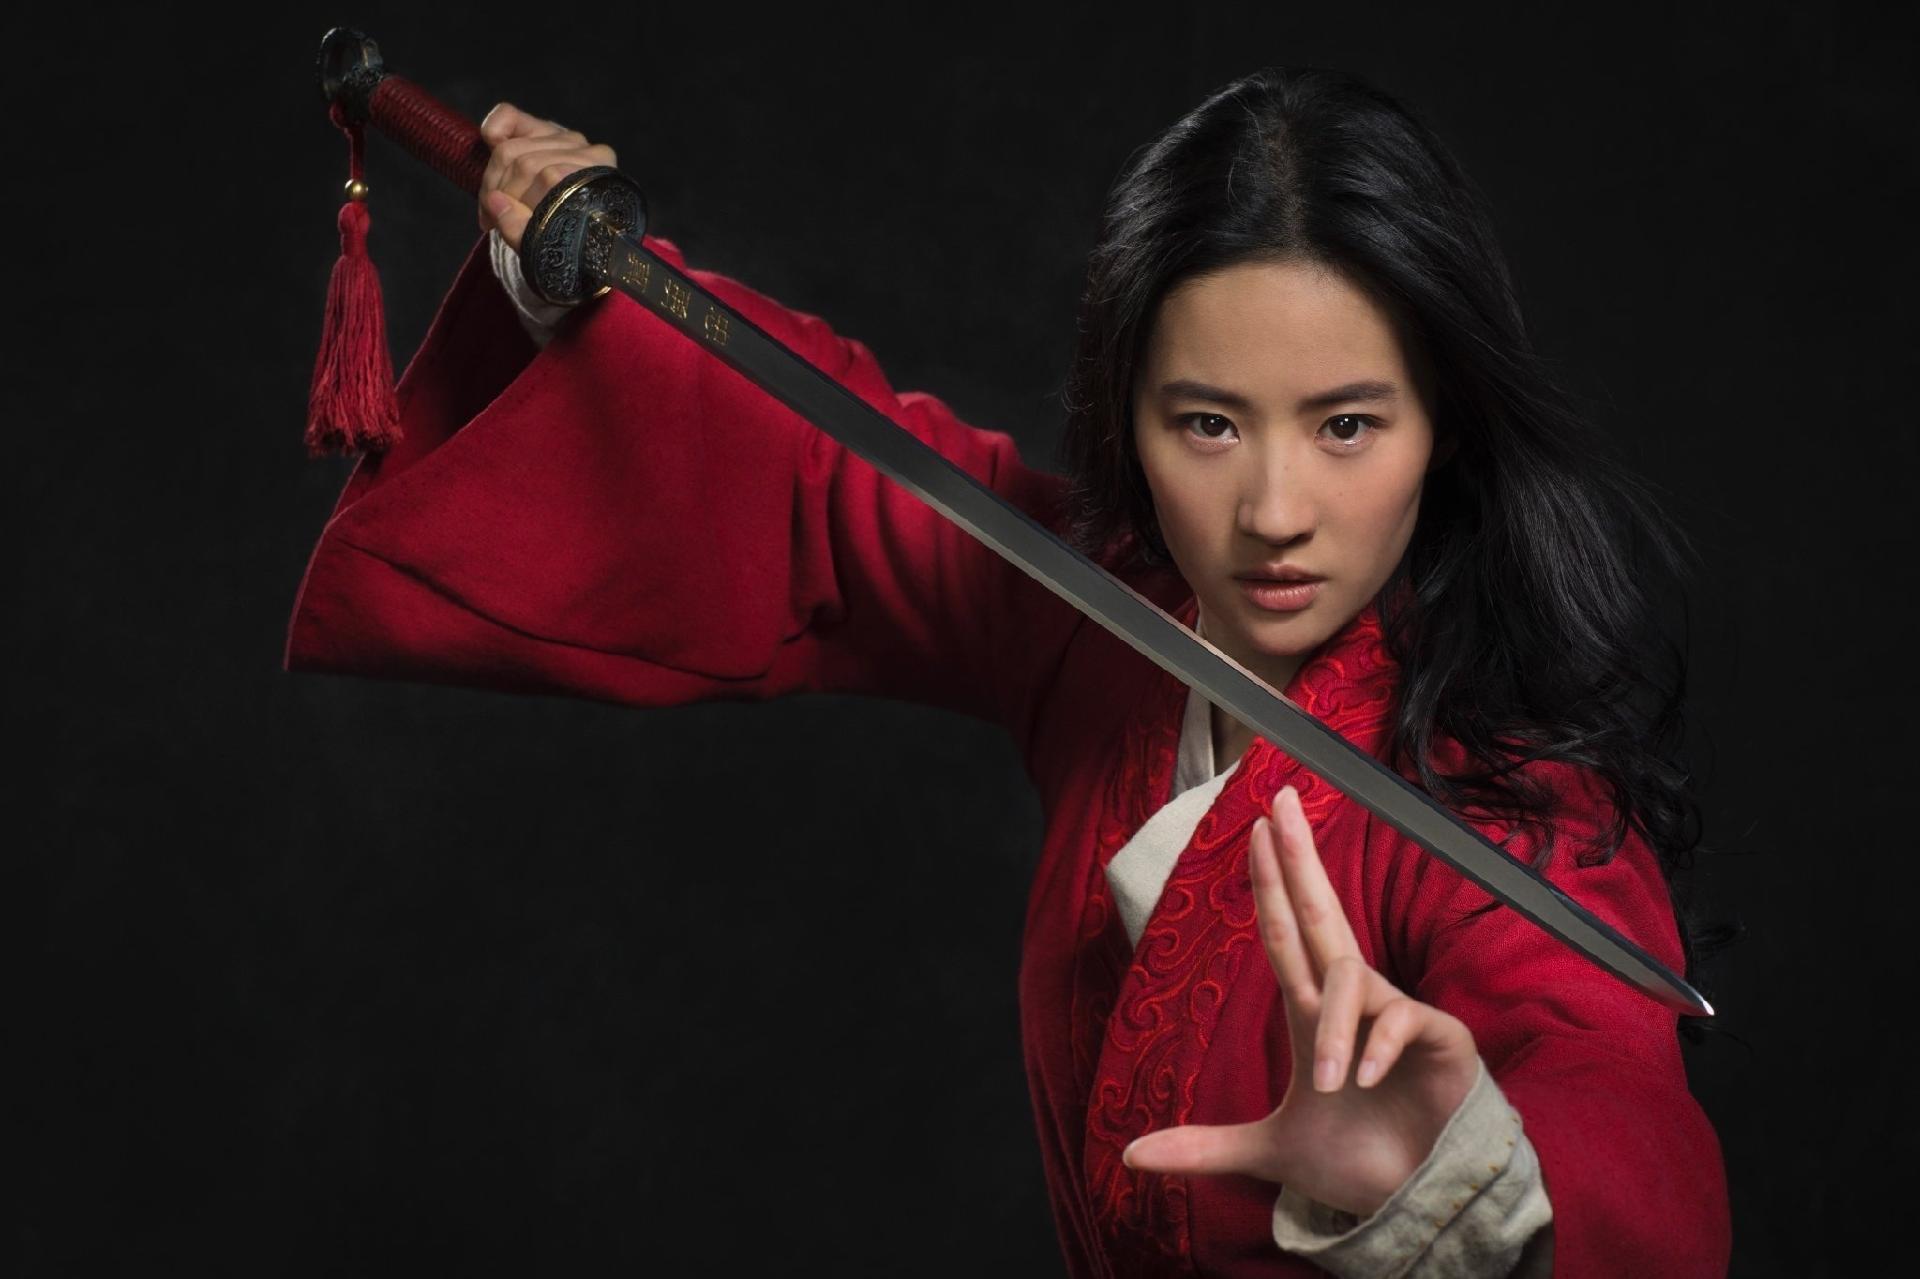 Mulan: Live-action pode ter estreia adiada na China devido coronavírus